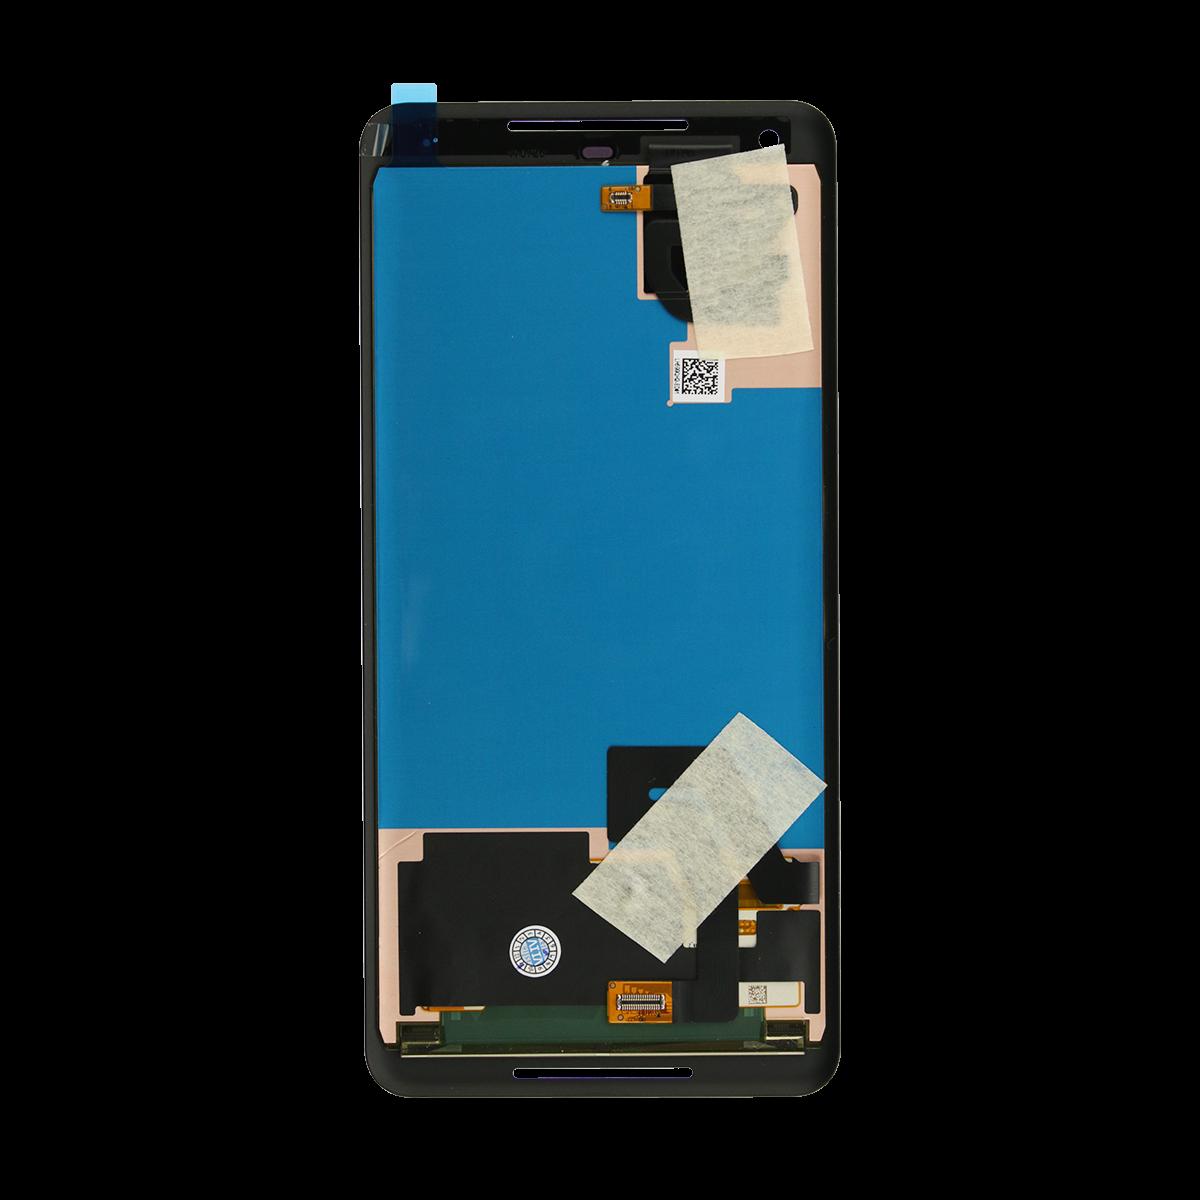 Original New Google Pixel 2 XL Display Assembly.